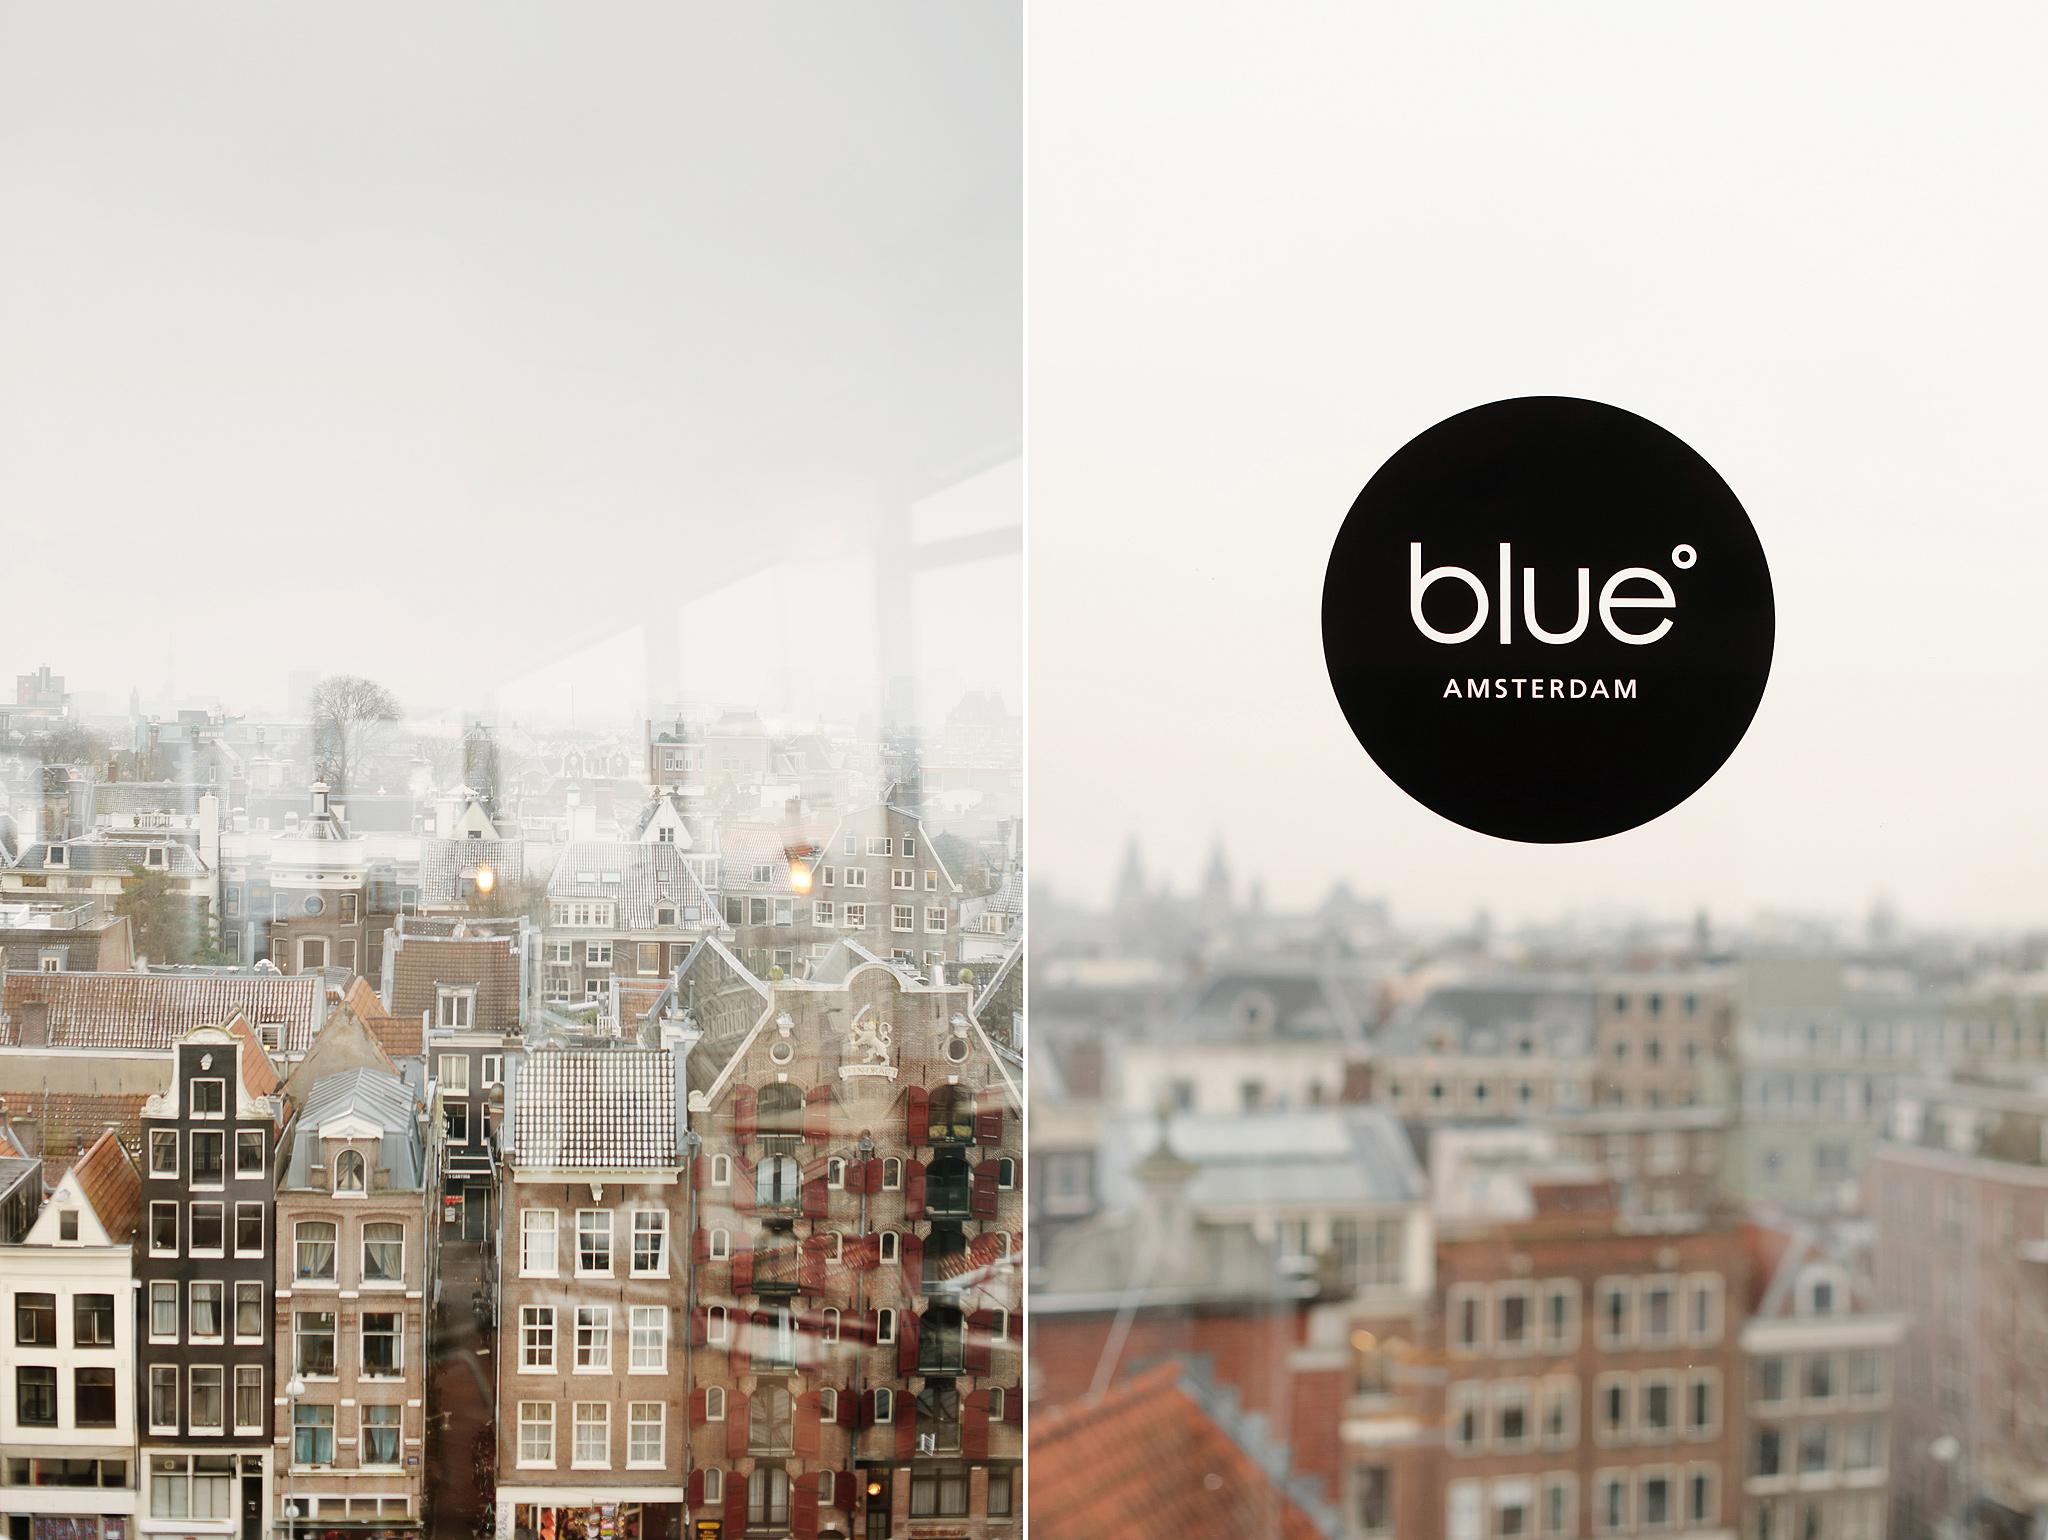 Blue Amsterdam, кафе с панорамным видом на старый город в Амстердаме